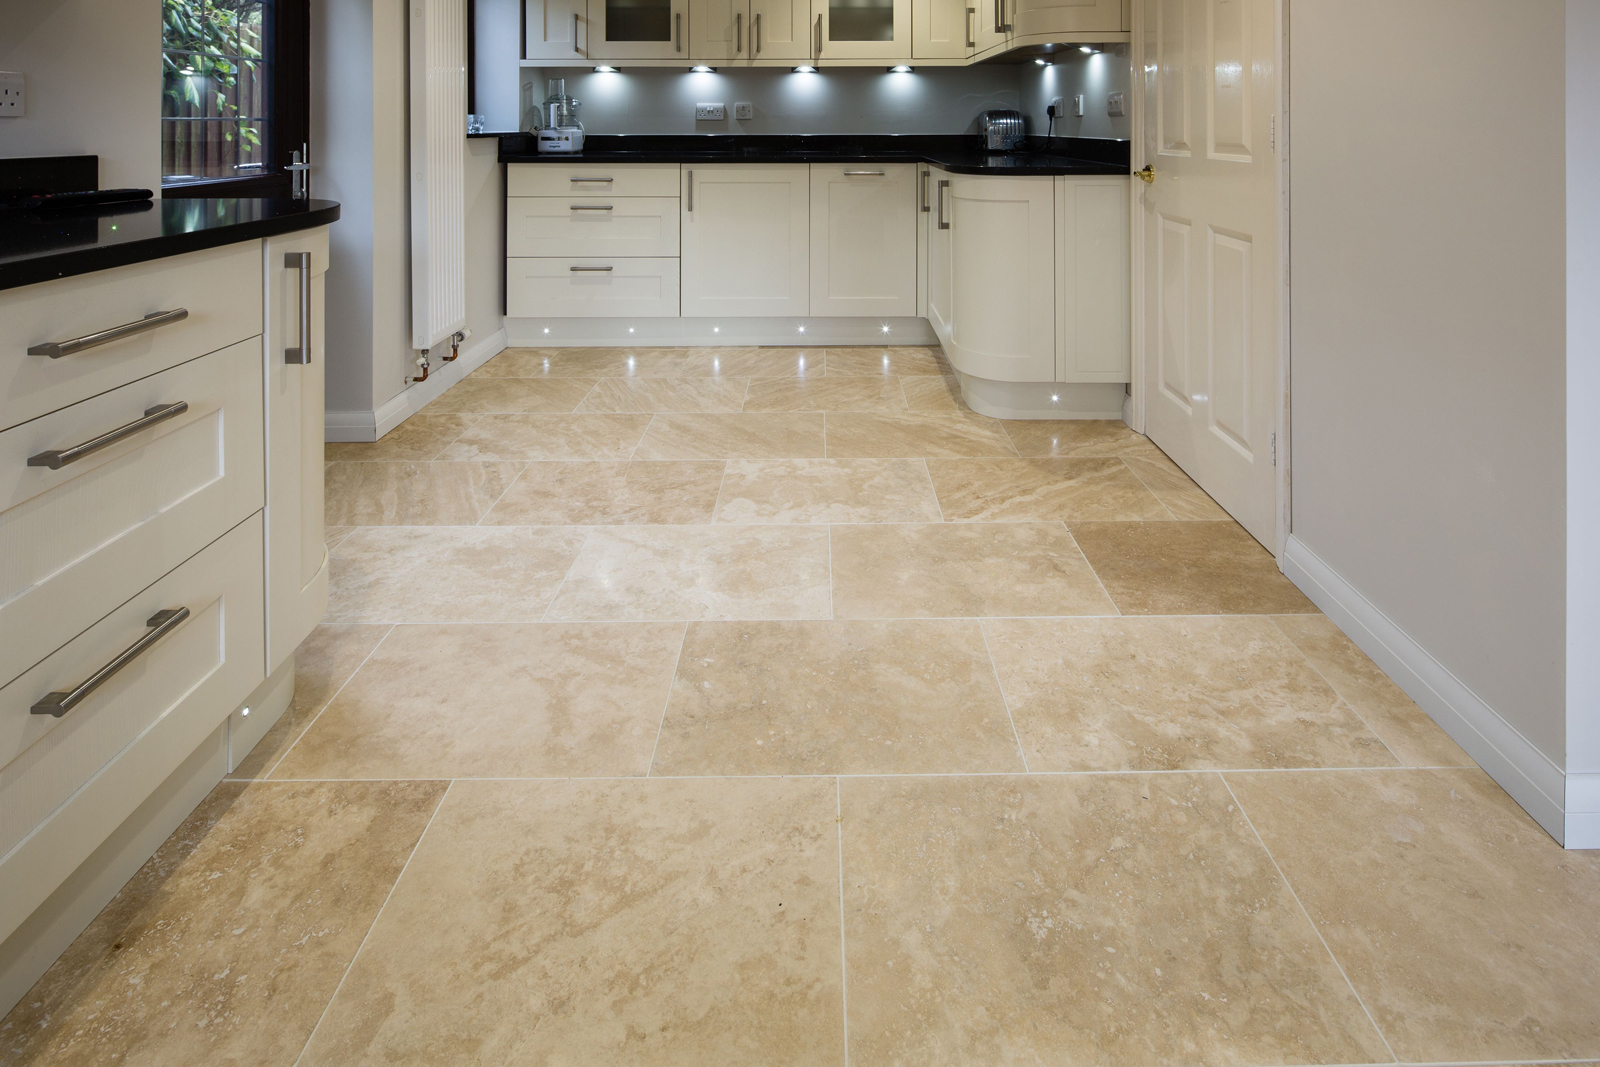 ionian honed filled travertine floor tile dt stone tile supplier